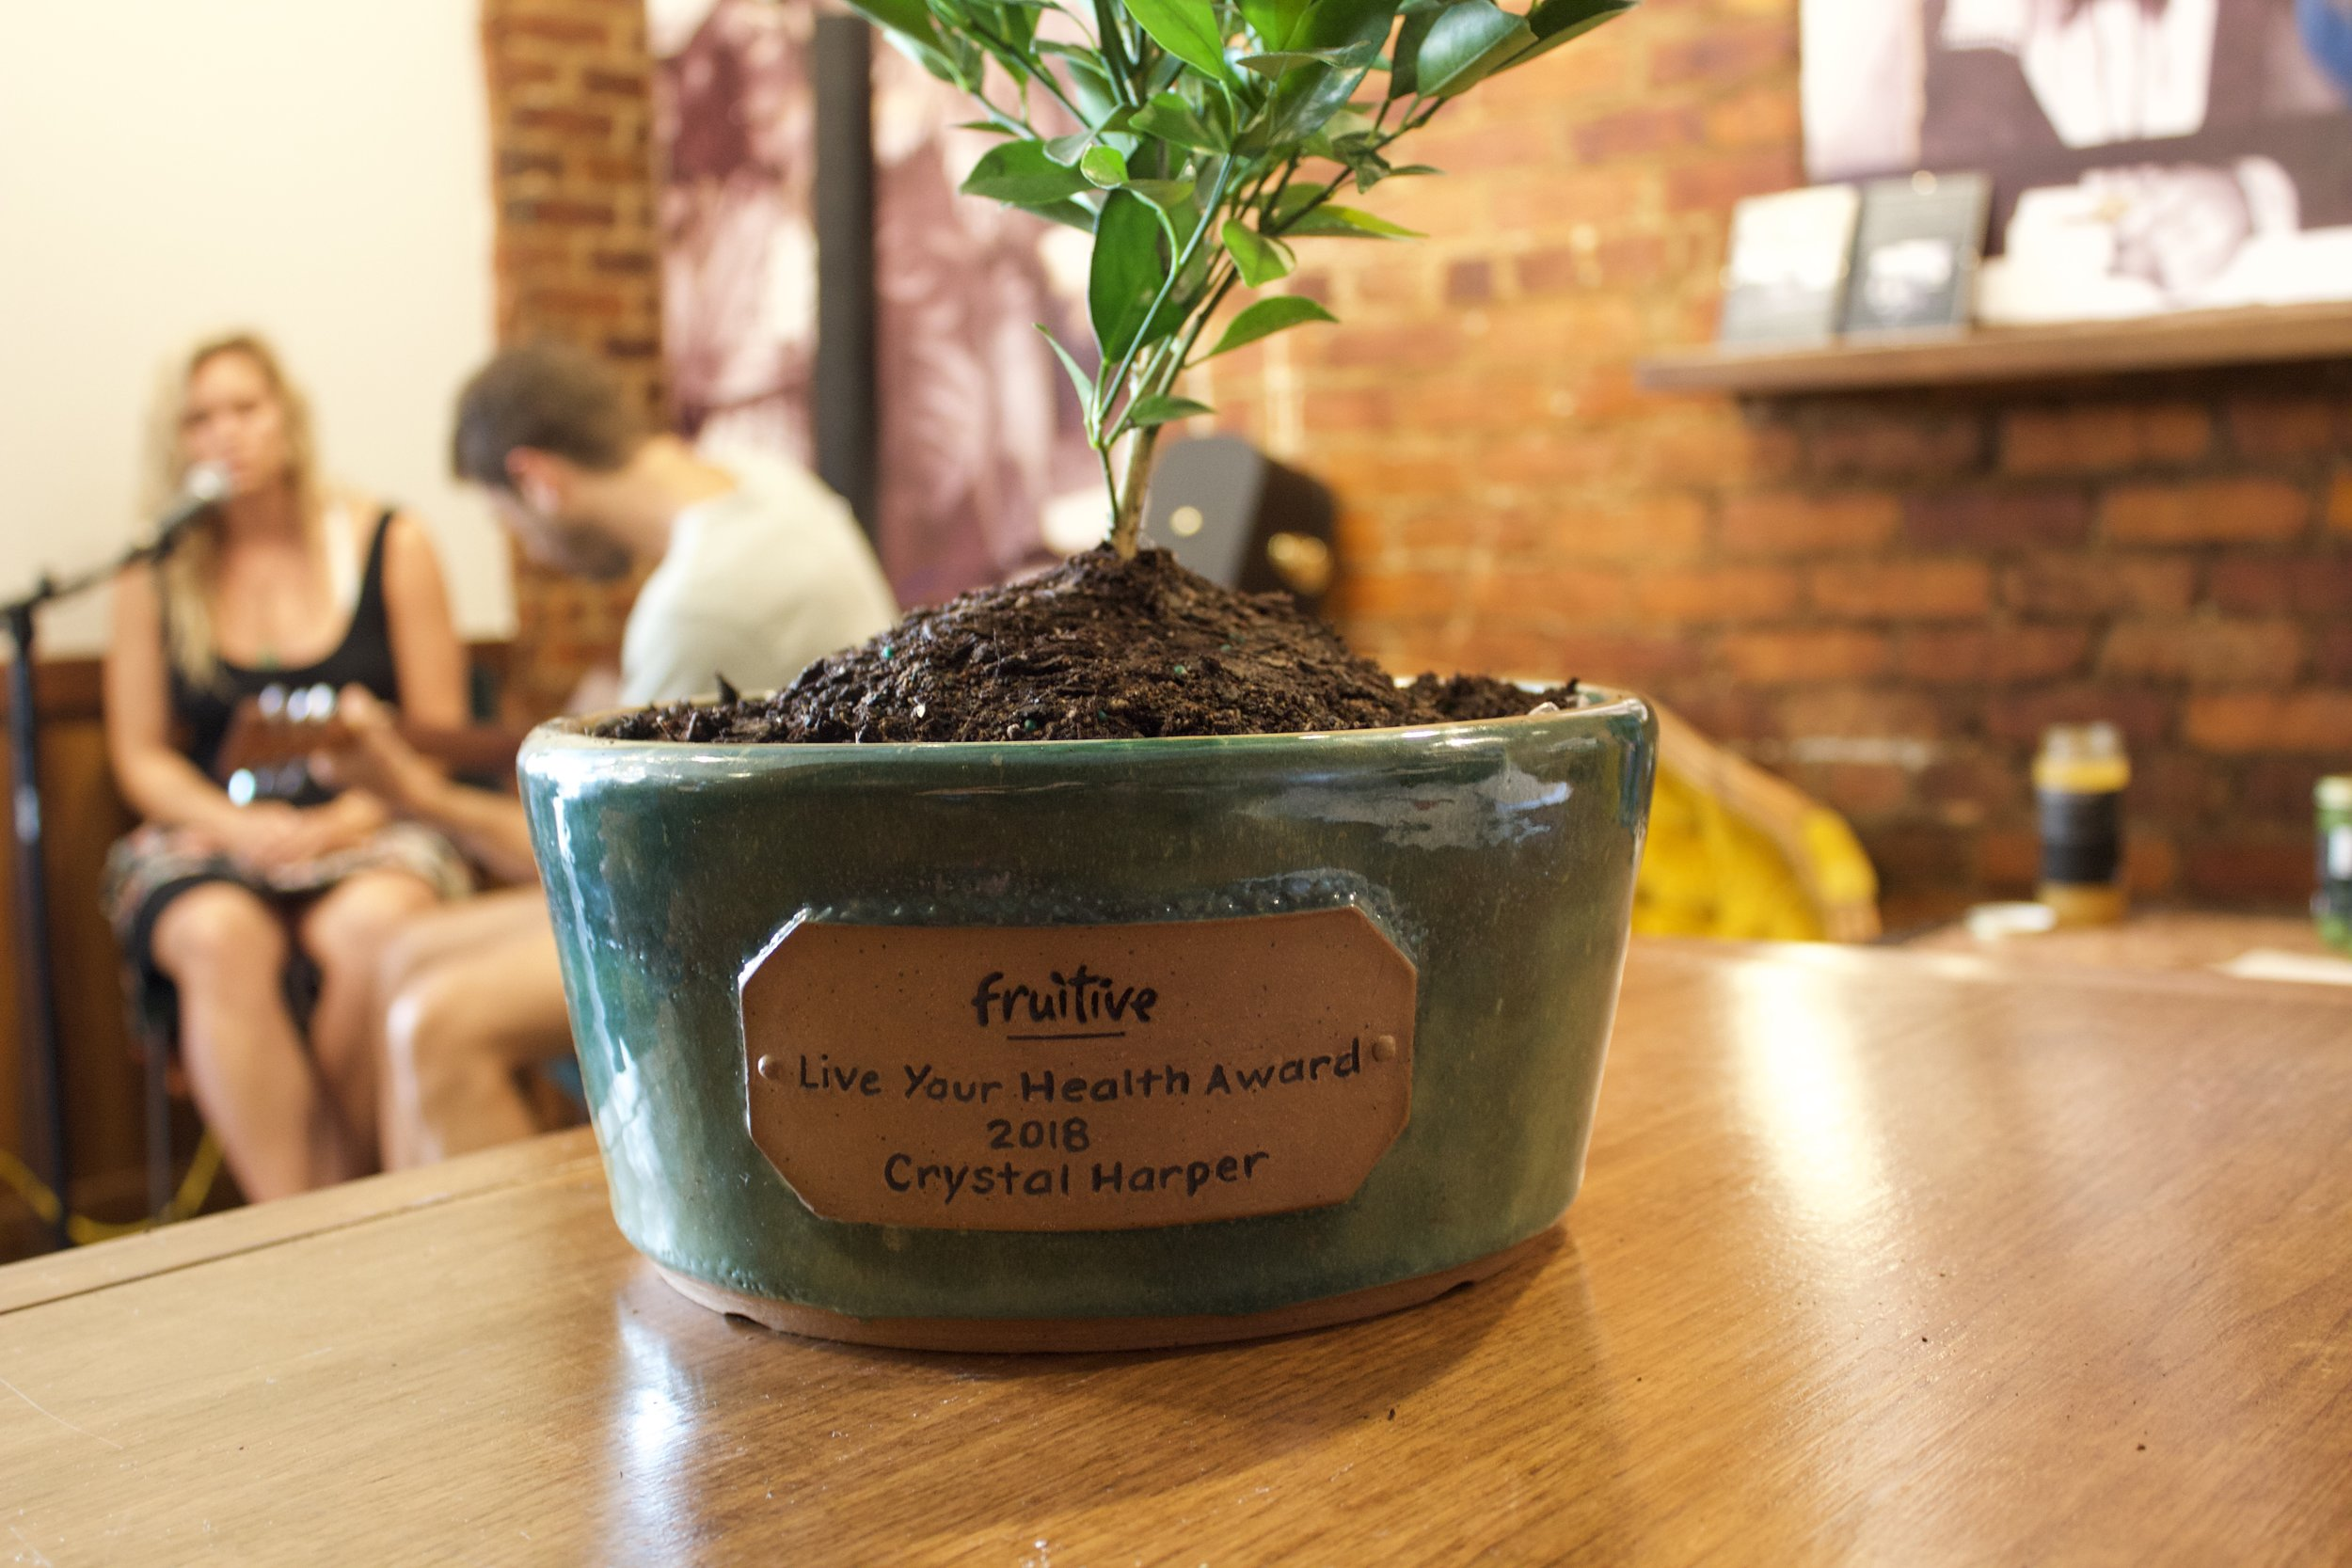 Local custom-made pot by William Kemp